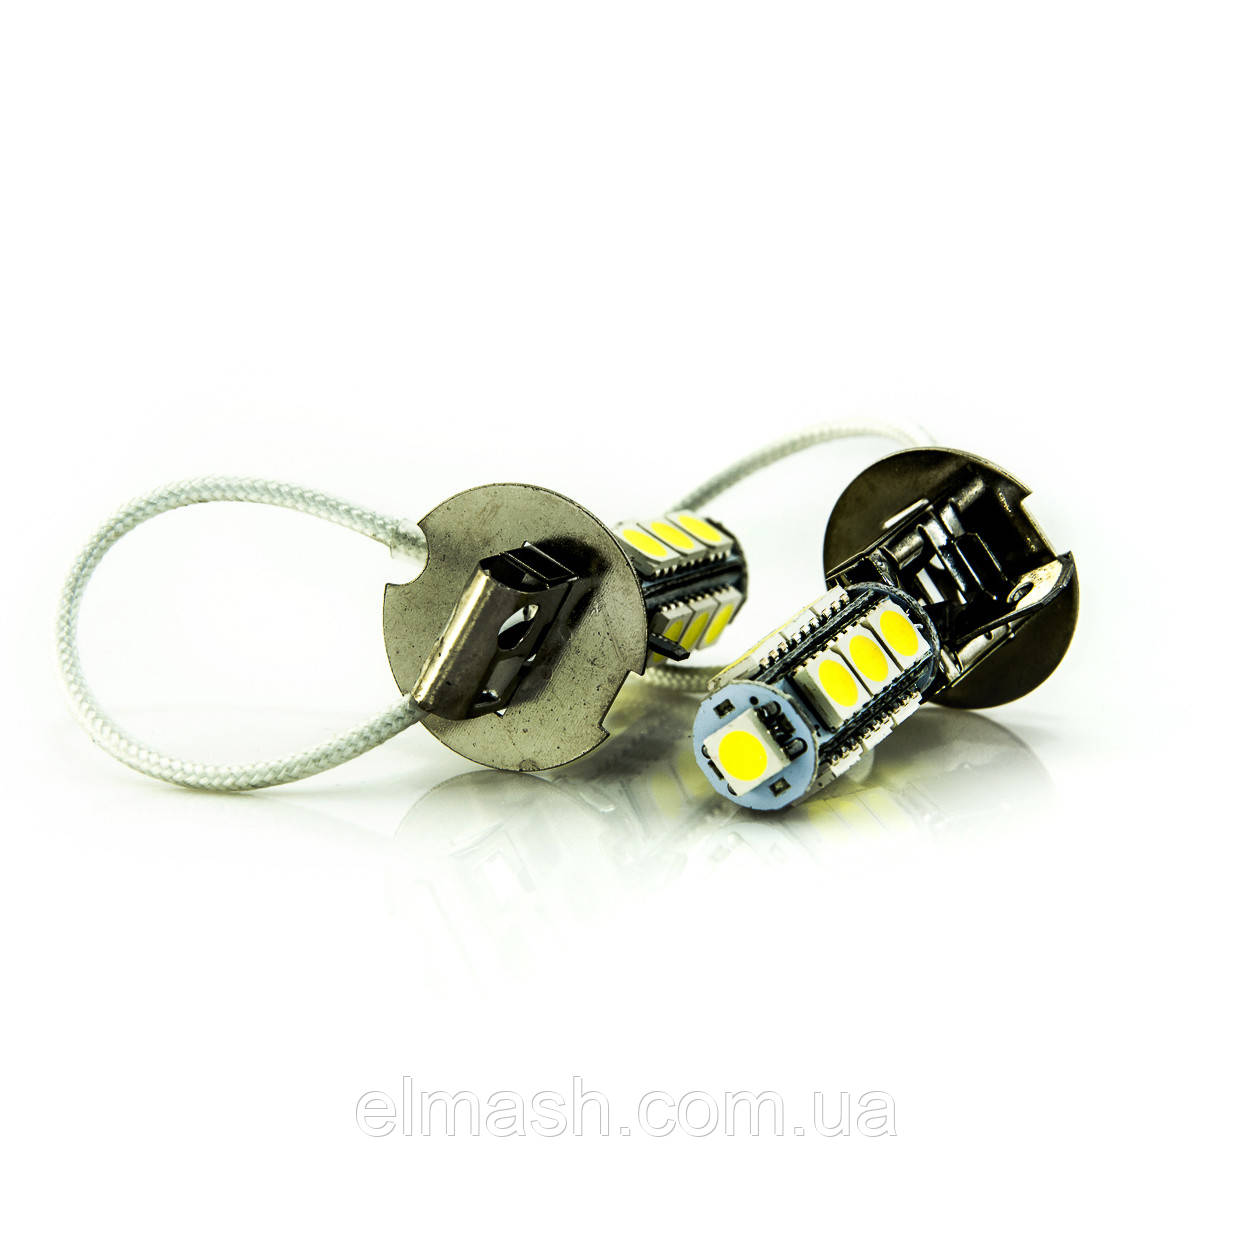 Лампа LED 24V H3  13SMD 5050 белый 80Lm